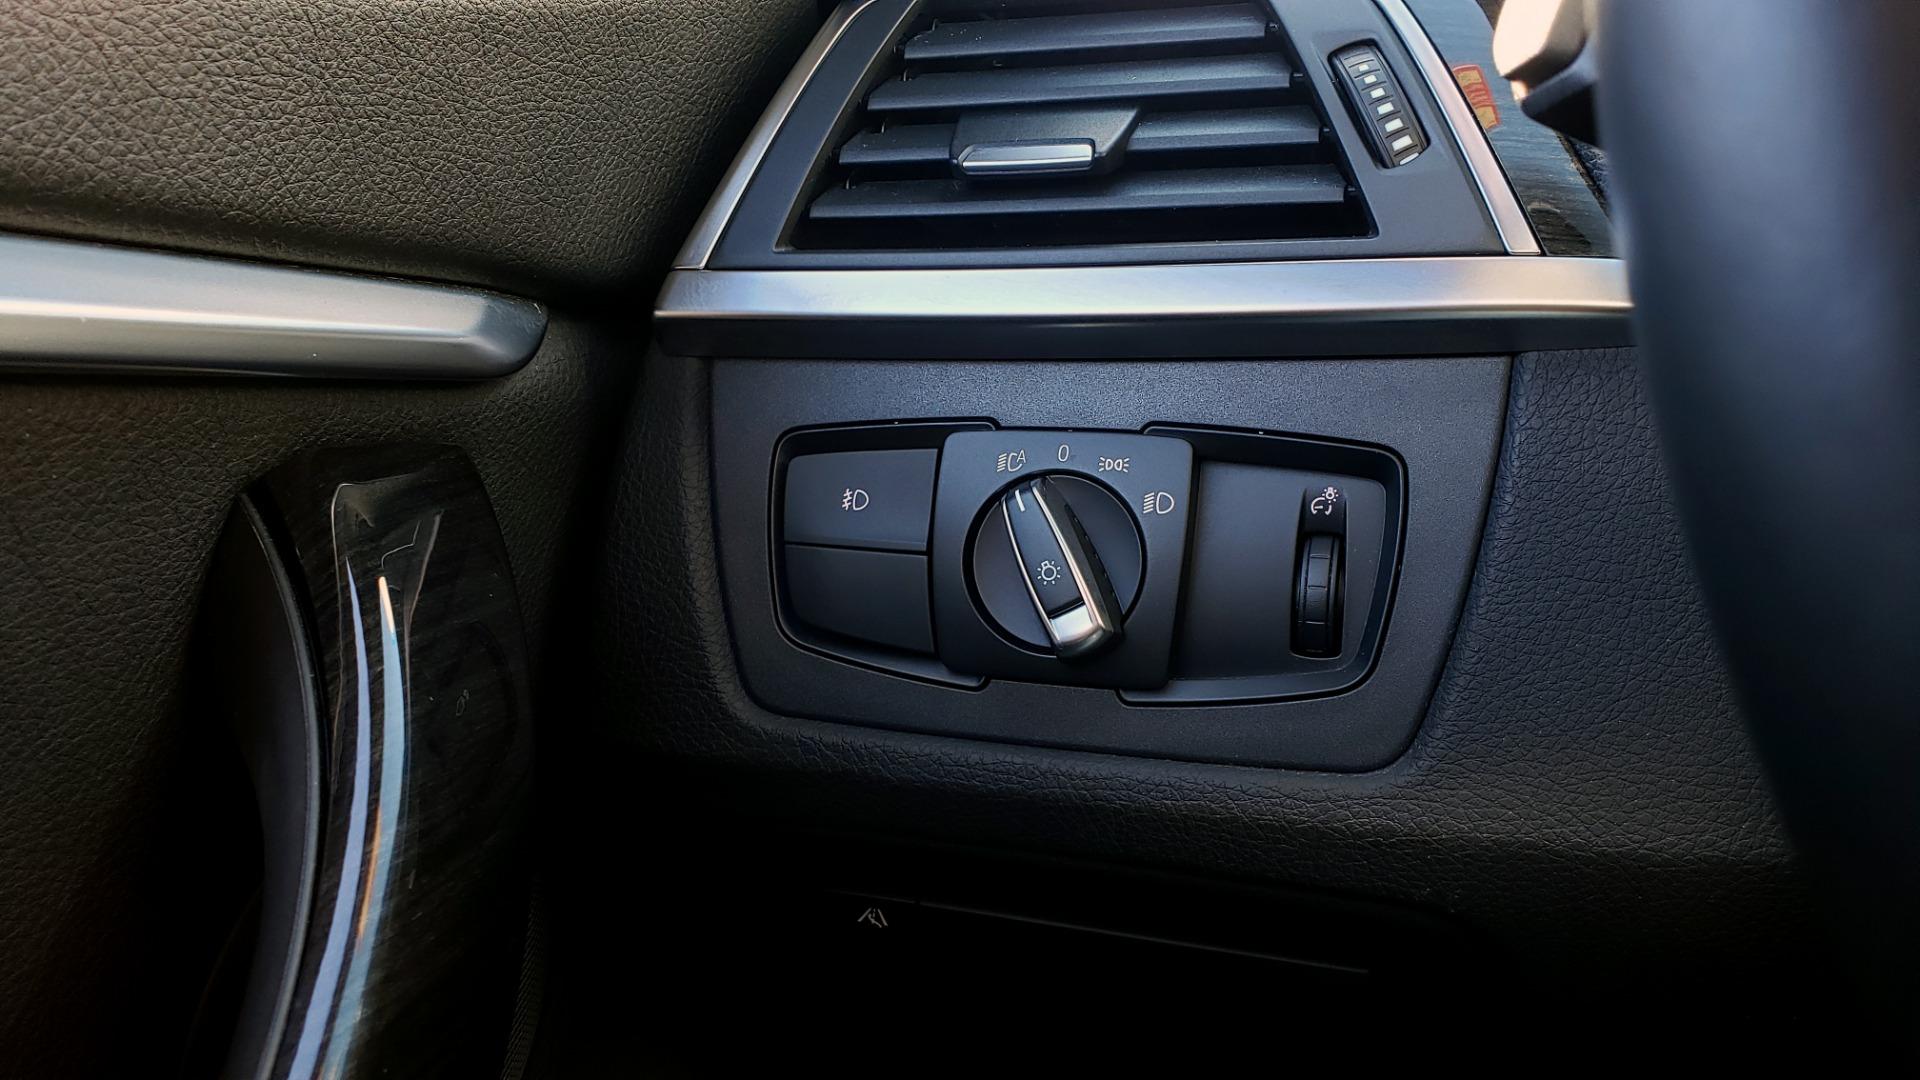 Used 2018 BMW 4 SERIES 430IXDRIVE / PREMIUM / NAV / SUNROOF / ESSENTIALS PKG for sale $27,795 at Formula Imports in Charlotte NC 28227 38